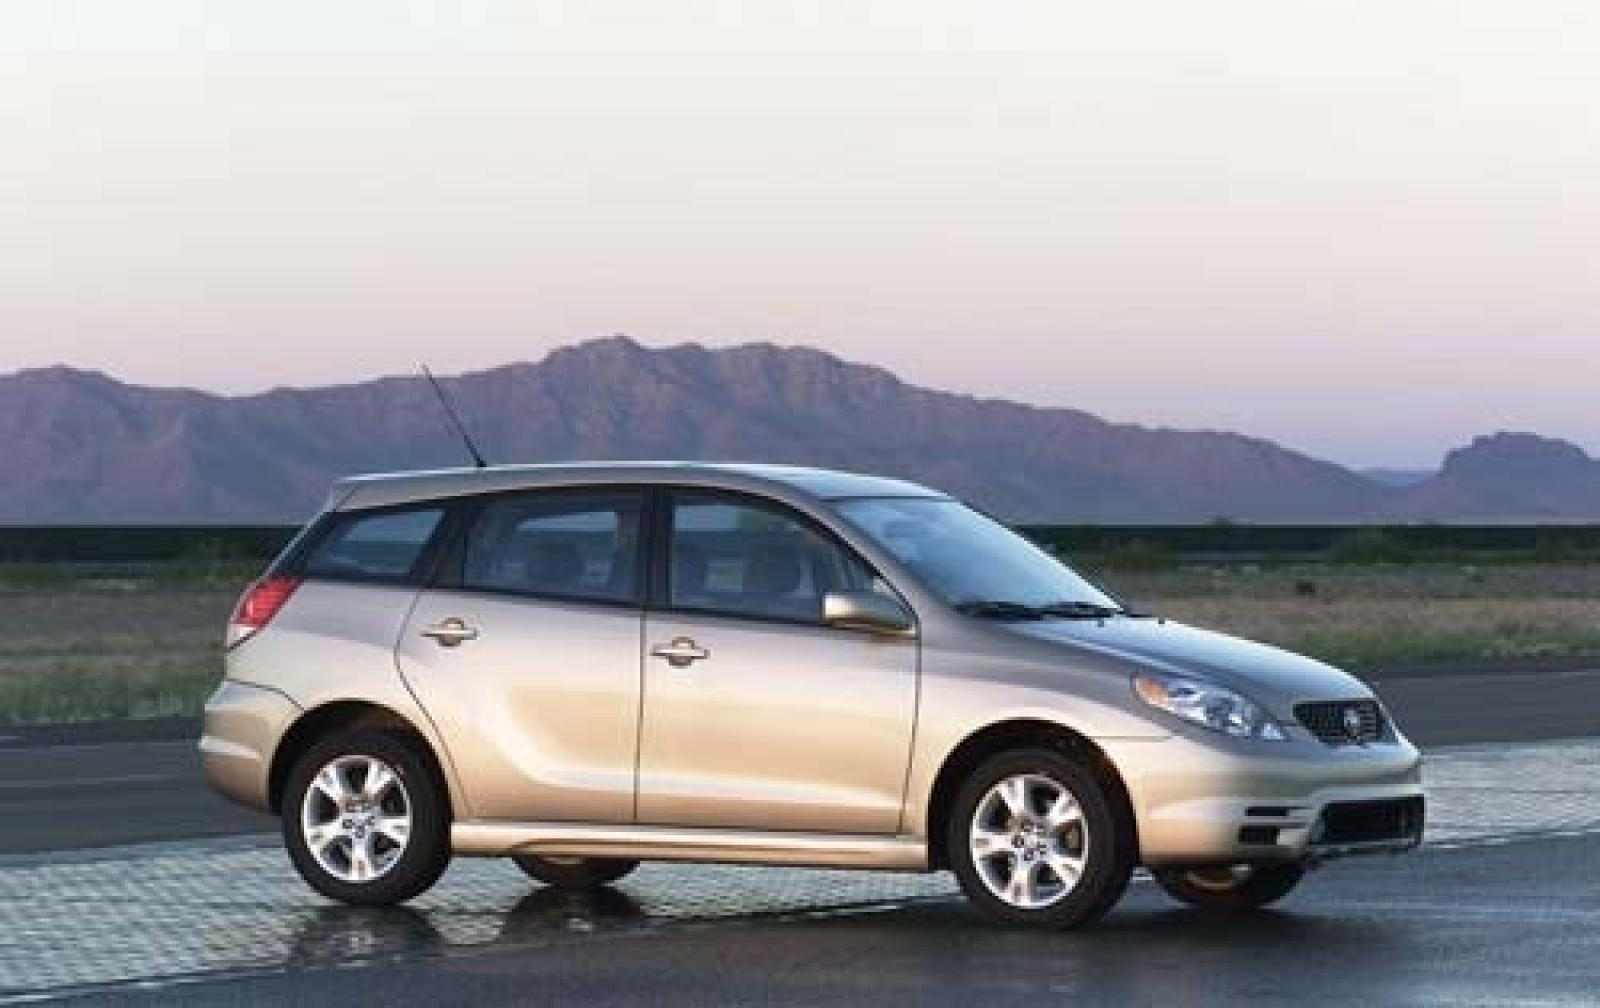 Toyota toyota matrix awd manual transmission : 2005 Toyota Matrix - Information and photos - ZombieDrive